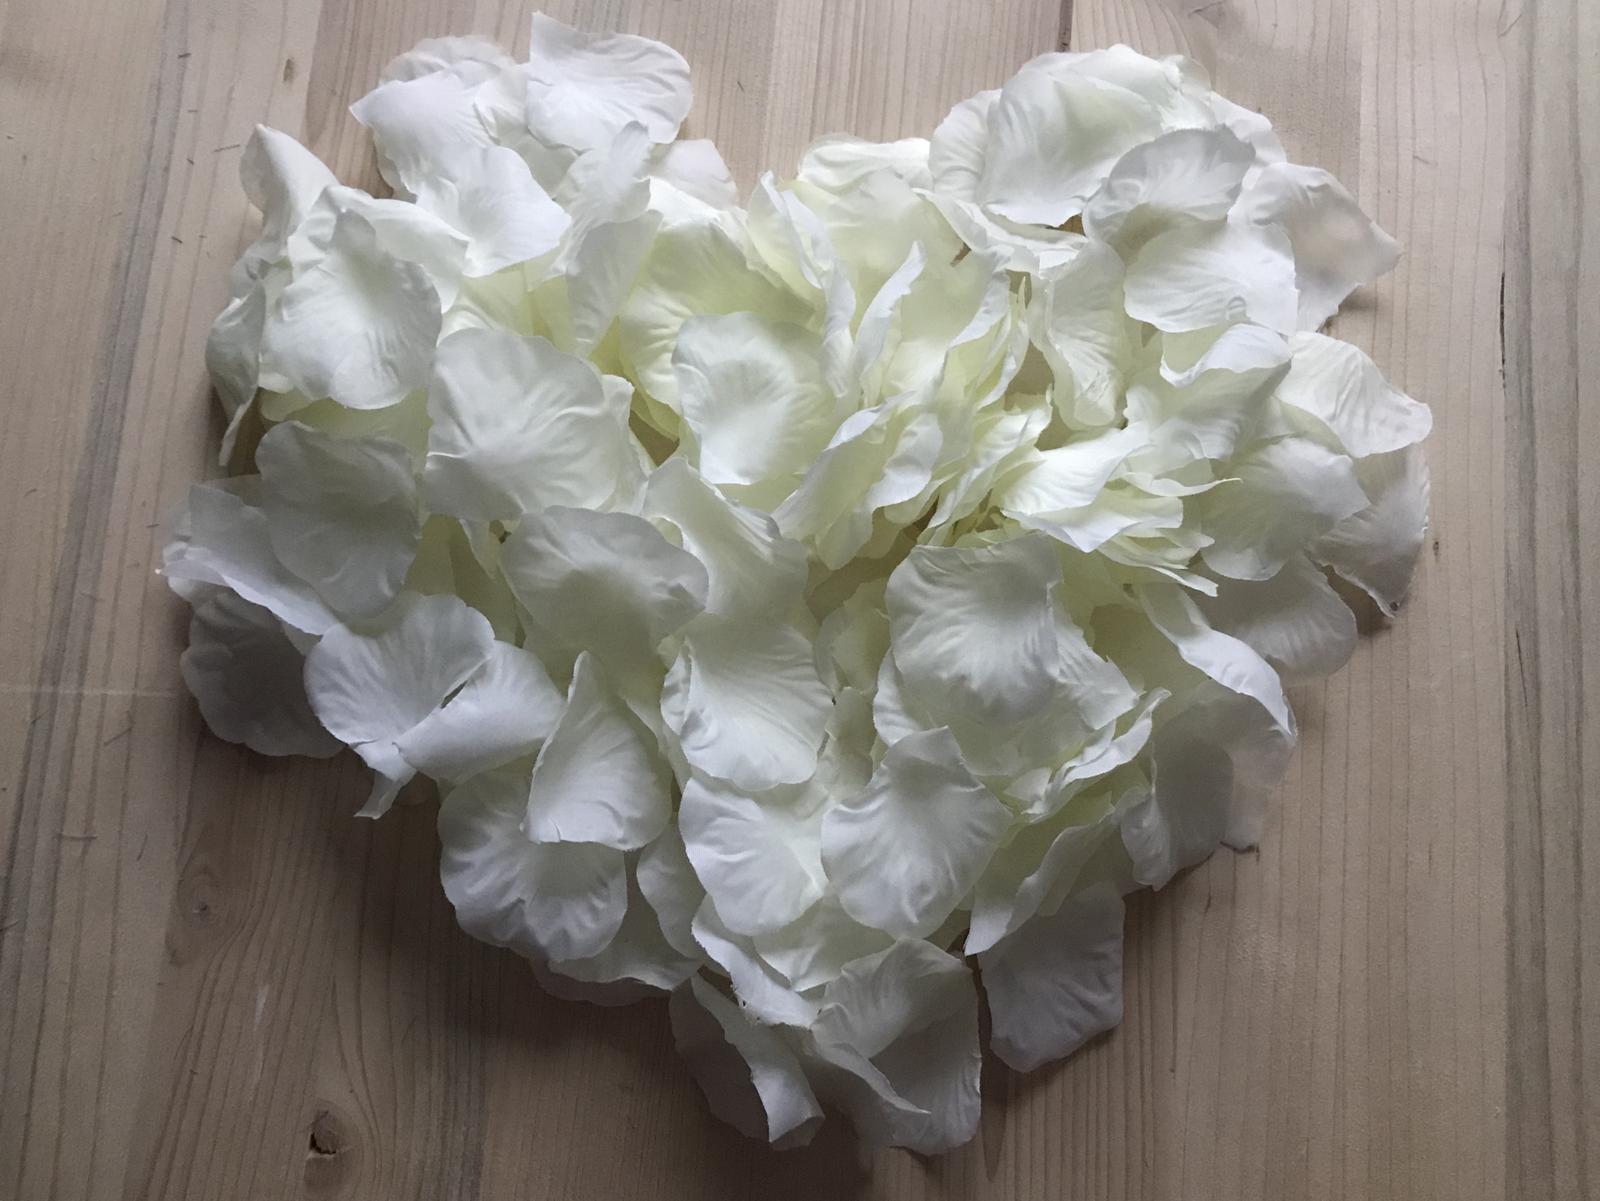 Lupene ruží 500ks - Obrázok č. 2